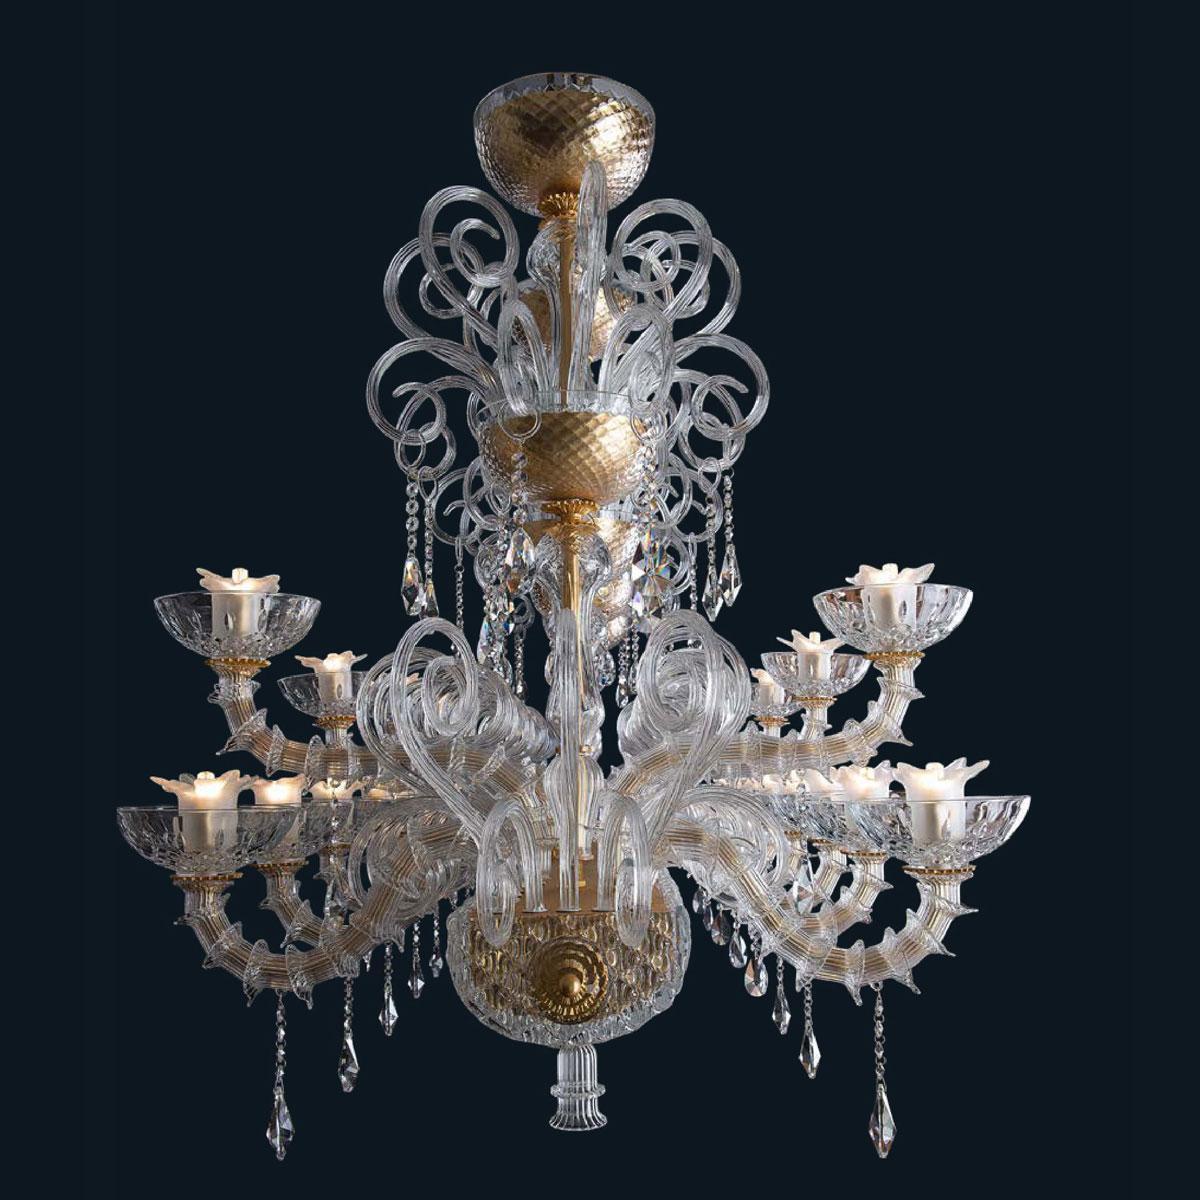 """Cedric"" Murano glass chandelier - 16+8 lights - transparent"